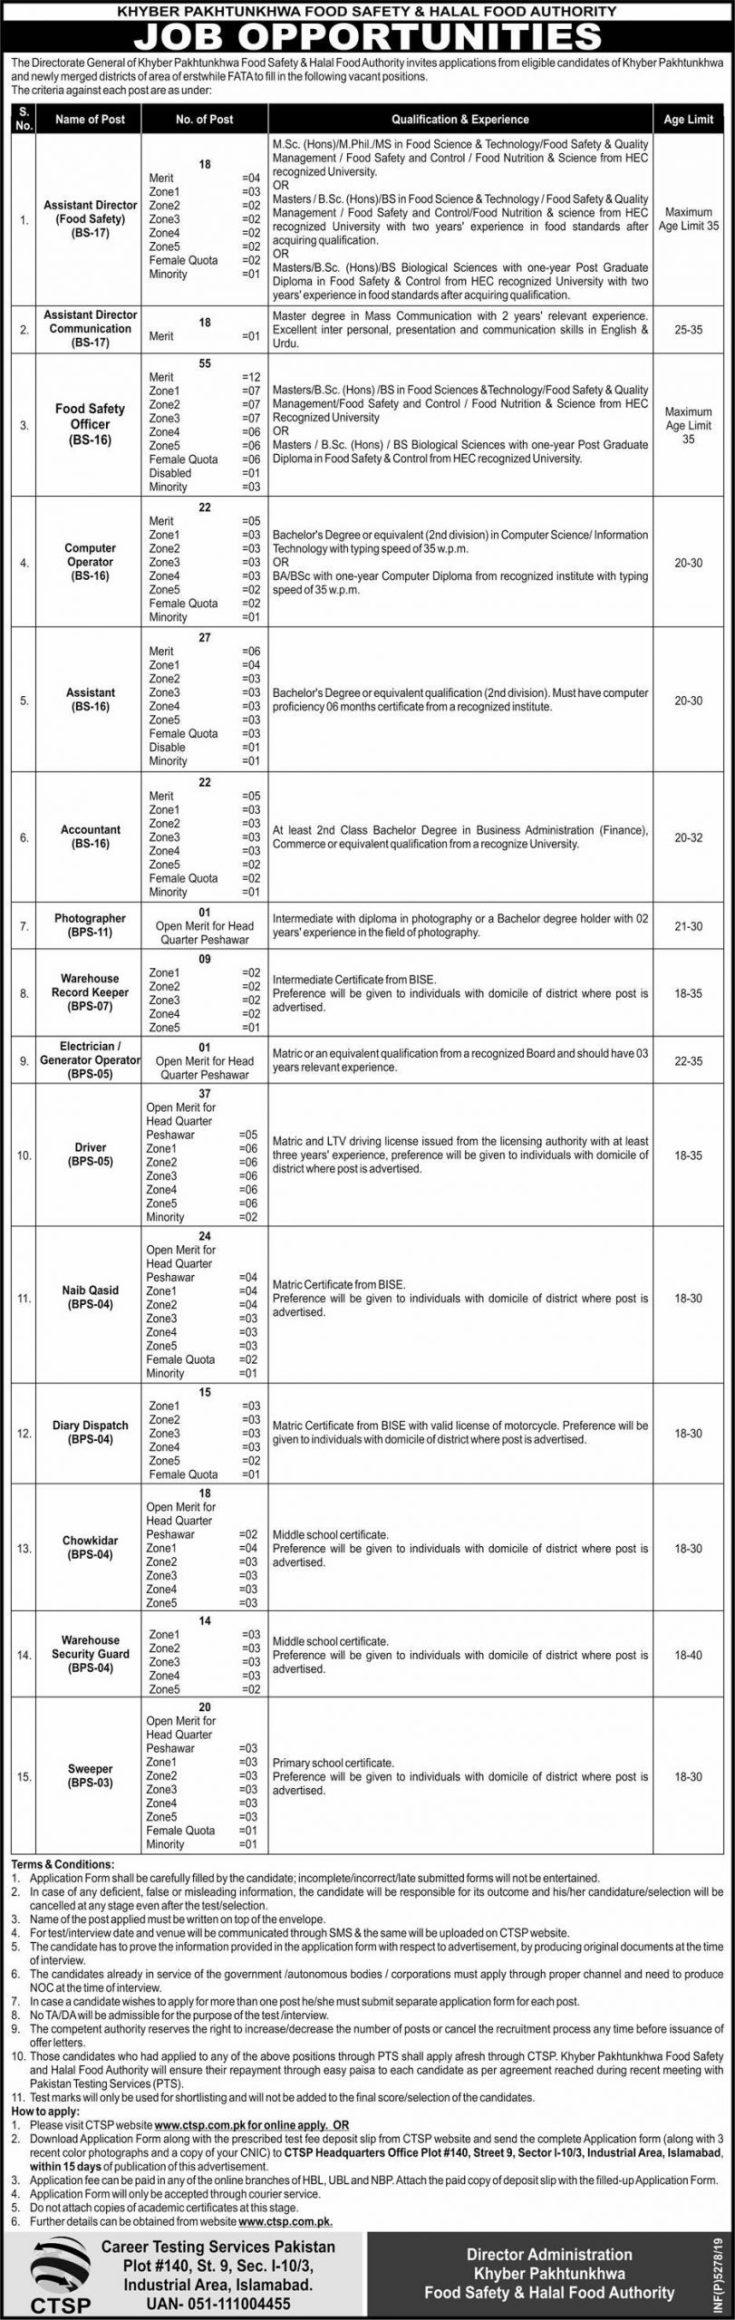 Halal Food Authority,latest merit list,jobs in pakistan 2019,pts merit list,answer keys of nts wapda,ctsp result,nts answers keys,kpk police merit list,merit list of nts wapda,accounts jobs in islamabad 2020,merit lists,meirt list,etea test result pakistan,nts result 2019,pesco test preparation 2020,nts,ots result 2019,answer key of jet,nts result bio/chm,how to check nts result 2019